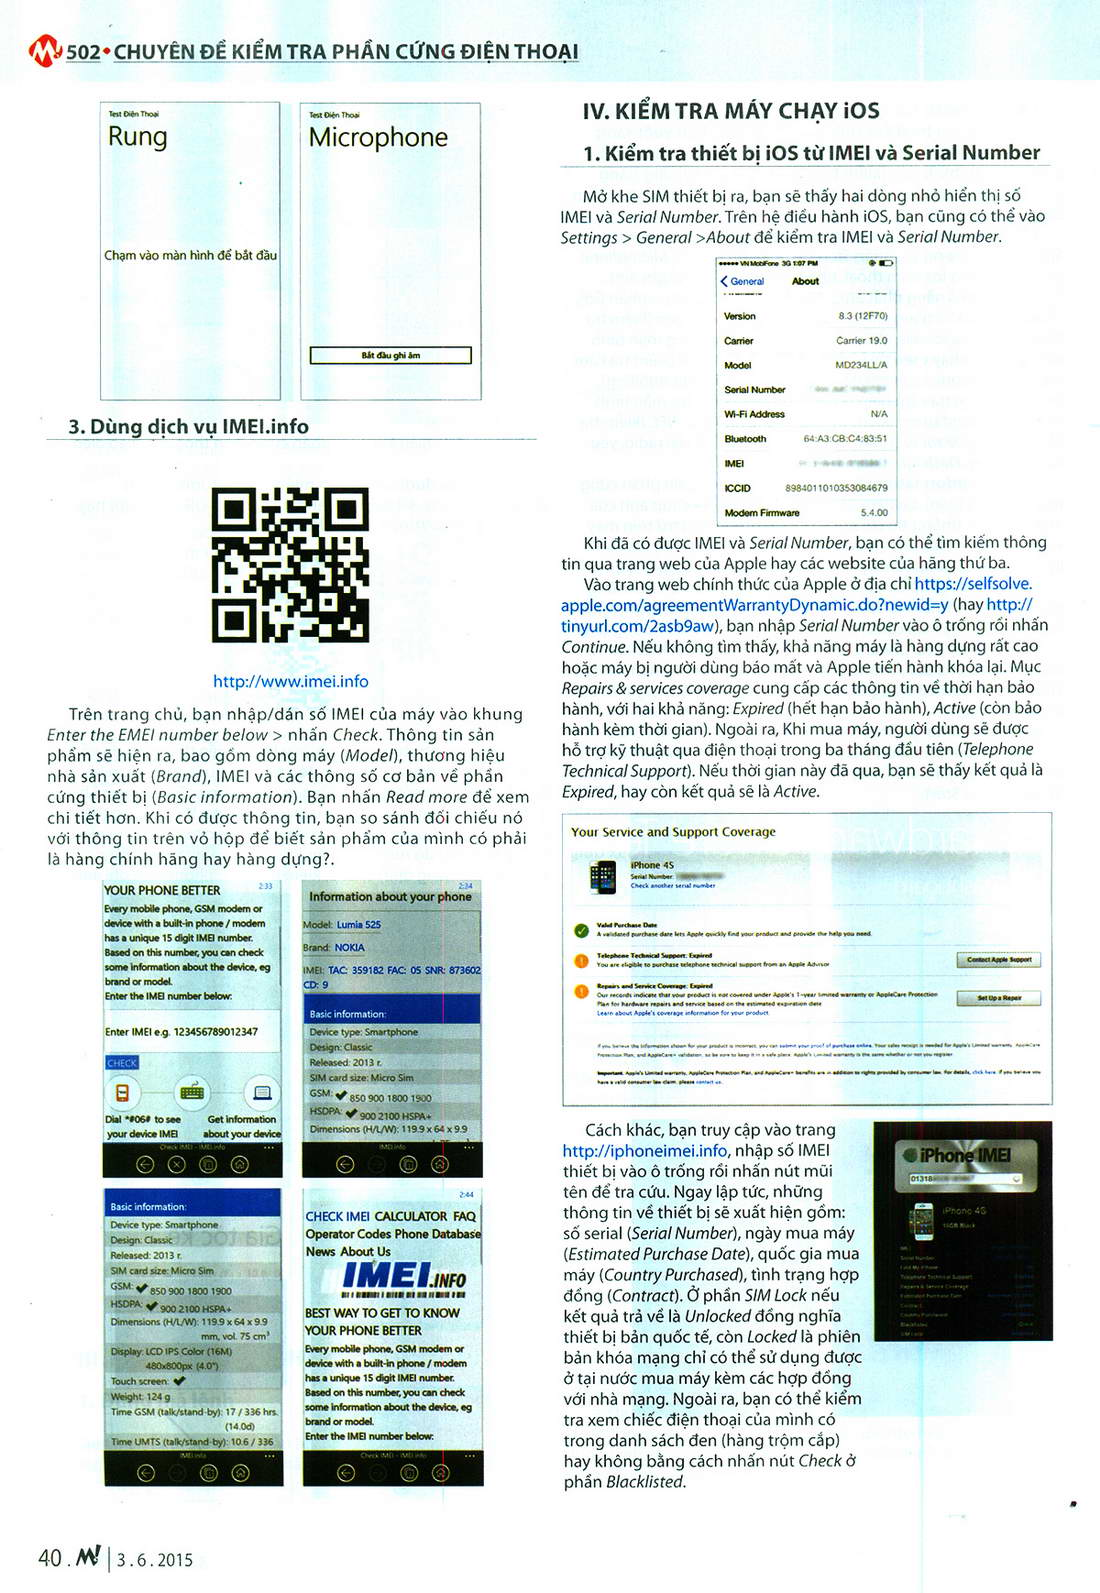 EChip Mobile 502 tapchicntt.com